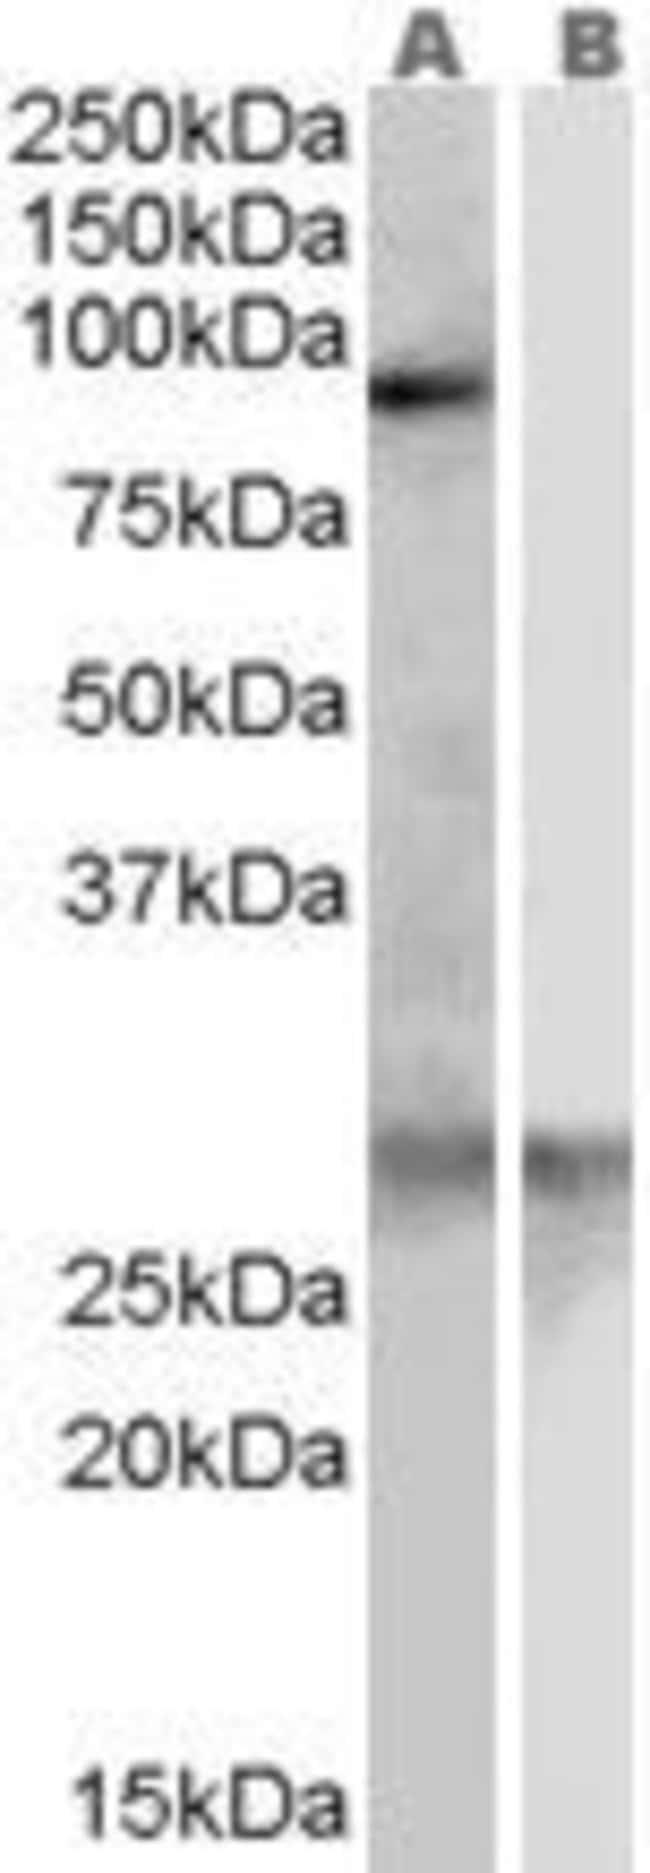 SCARF1 Goat anti-Human, Polyclonal, Invitrogen 100 µg; Unconjugated